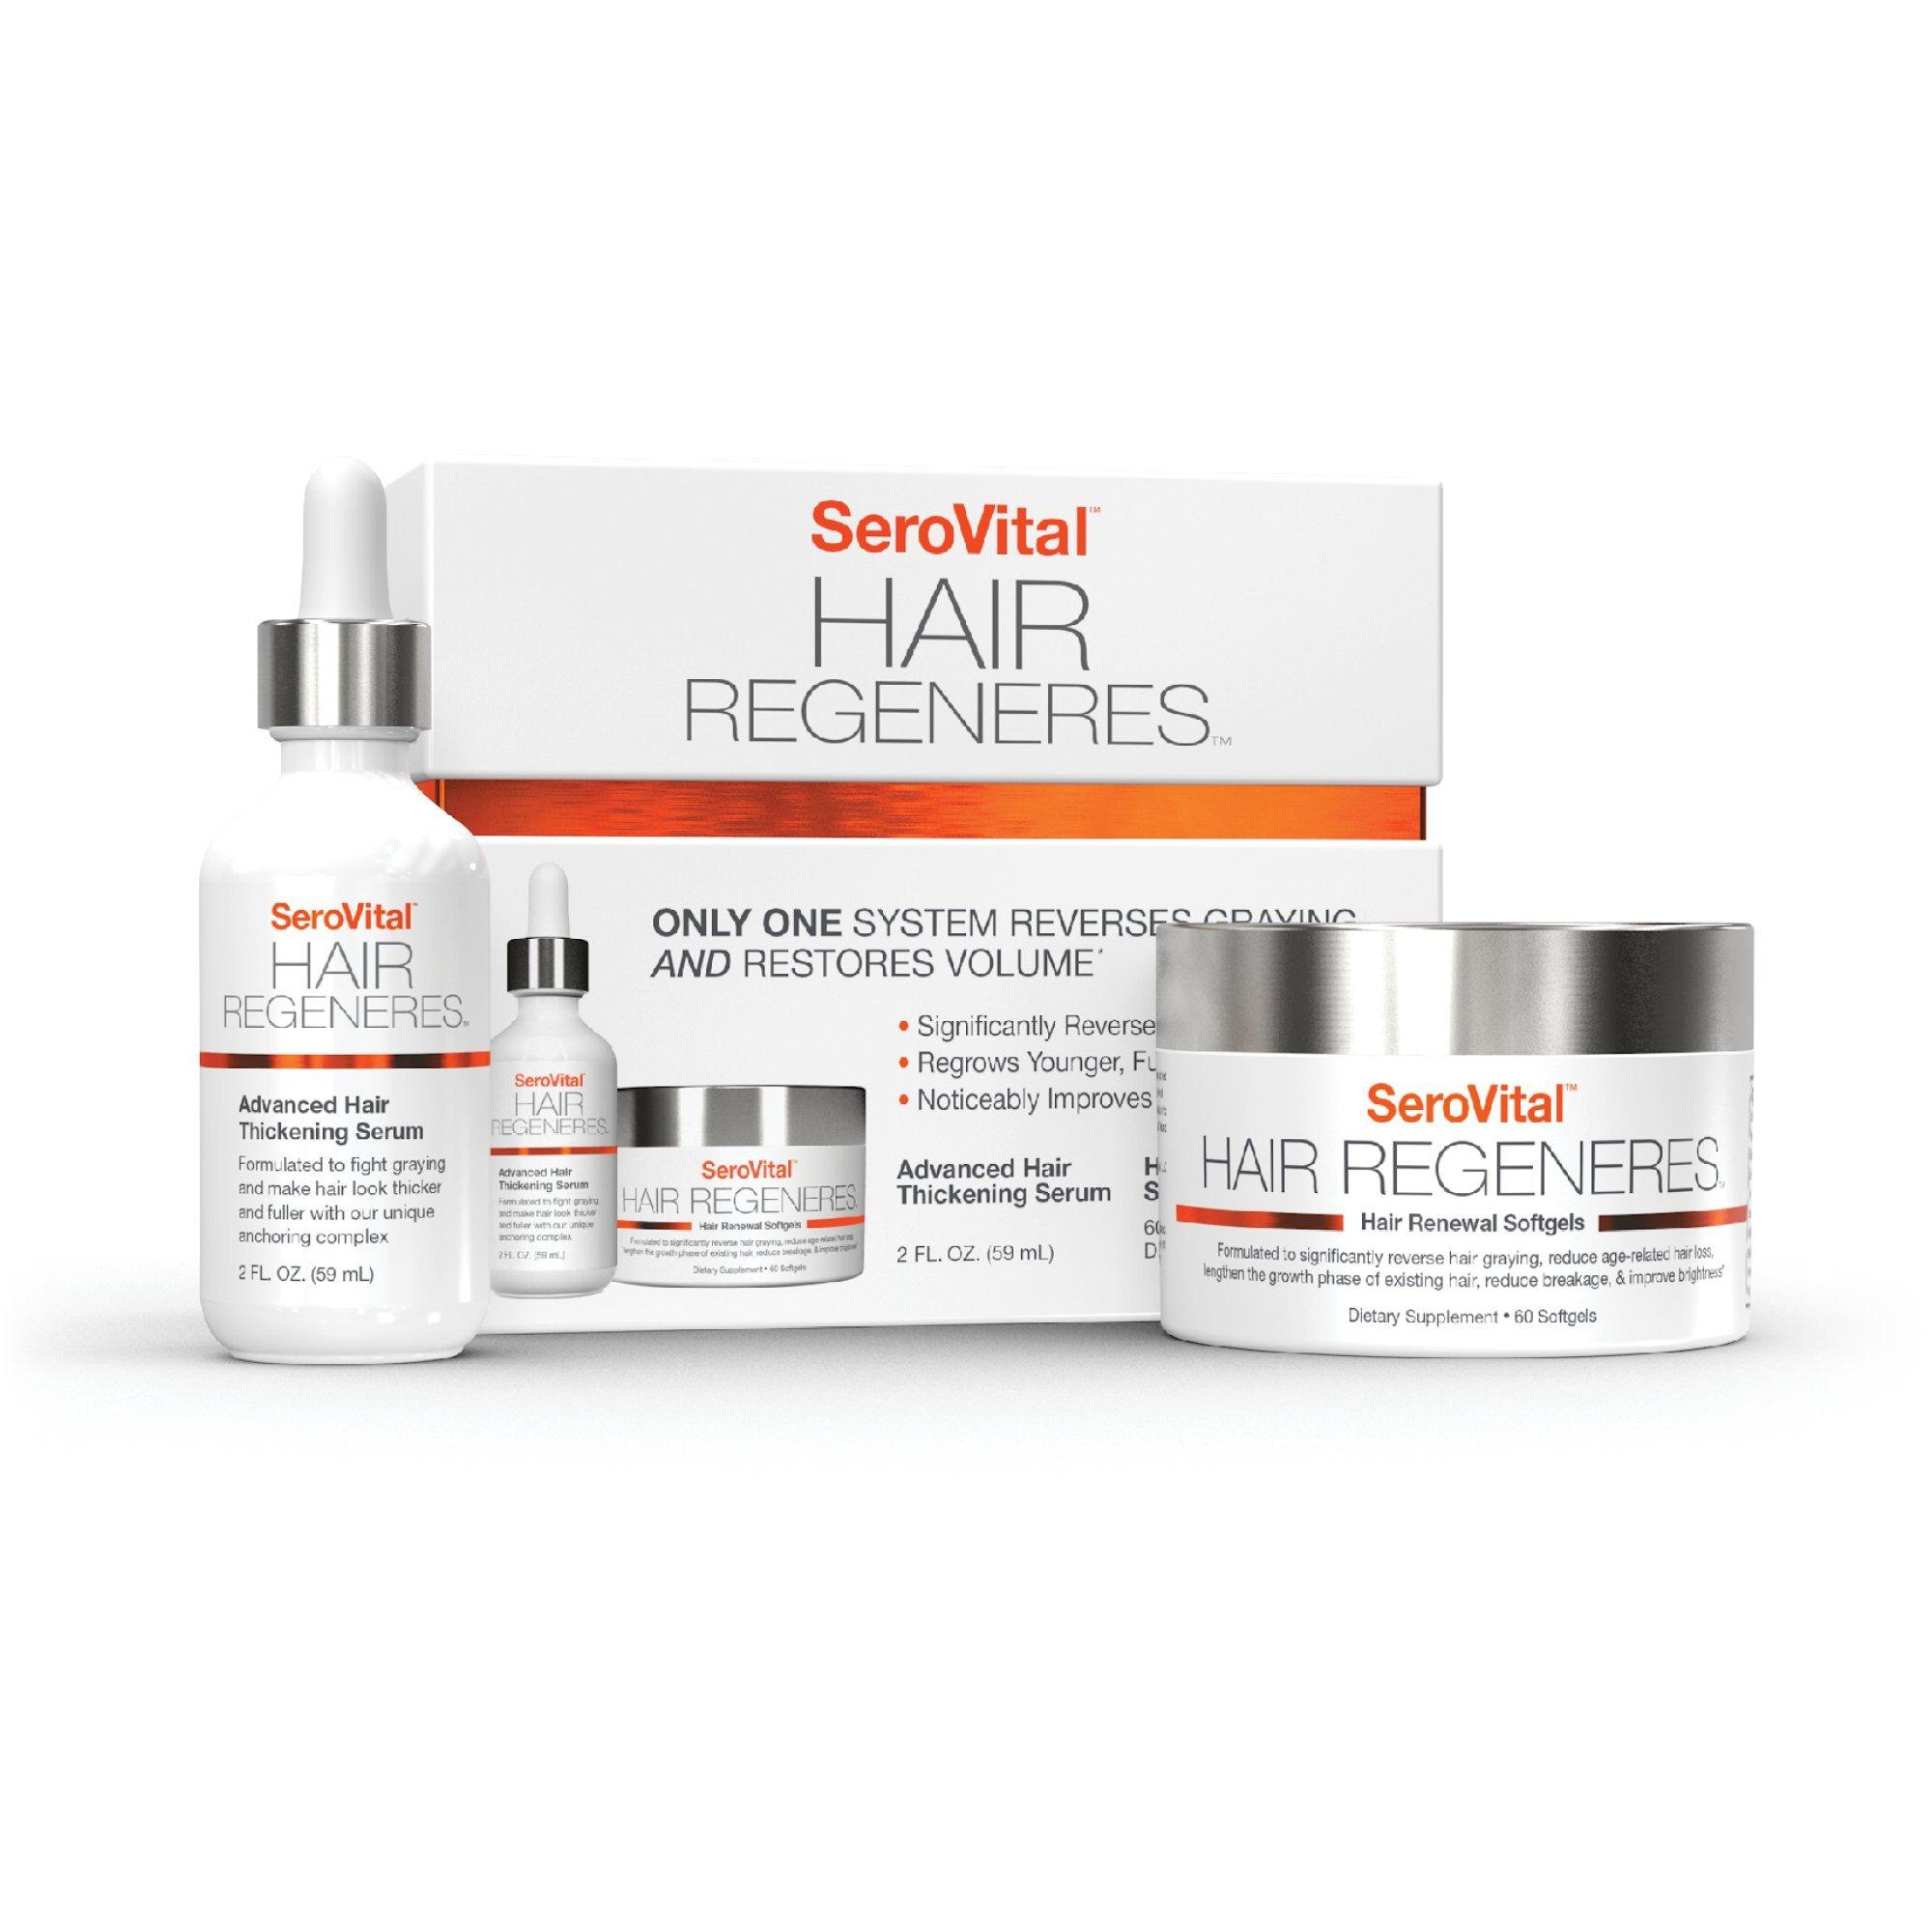 SeroVital Hair Regeneres Kit, 30 Day Supply by Serovital